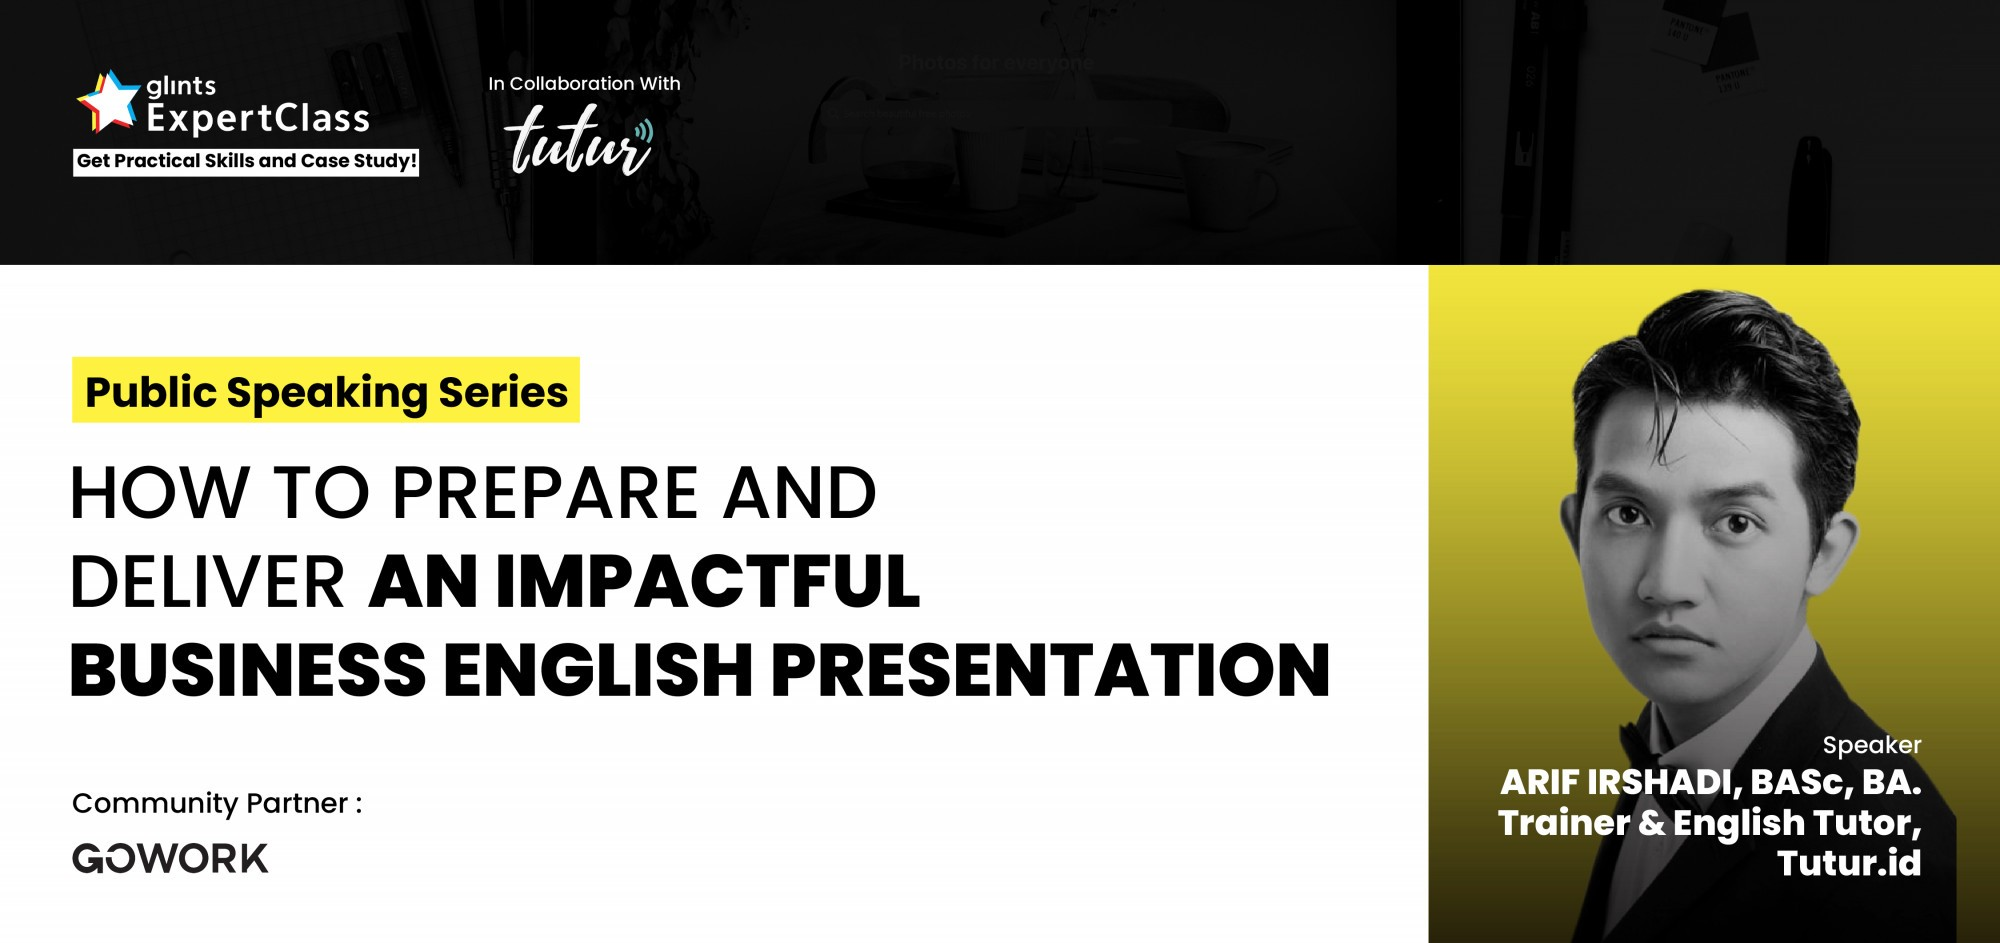 poster glints business english presentation